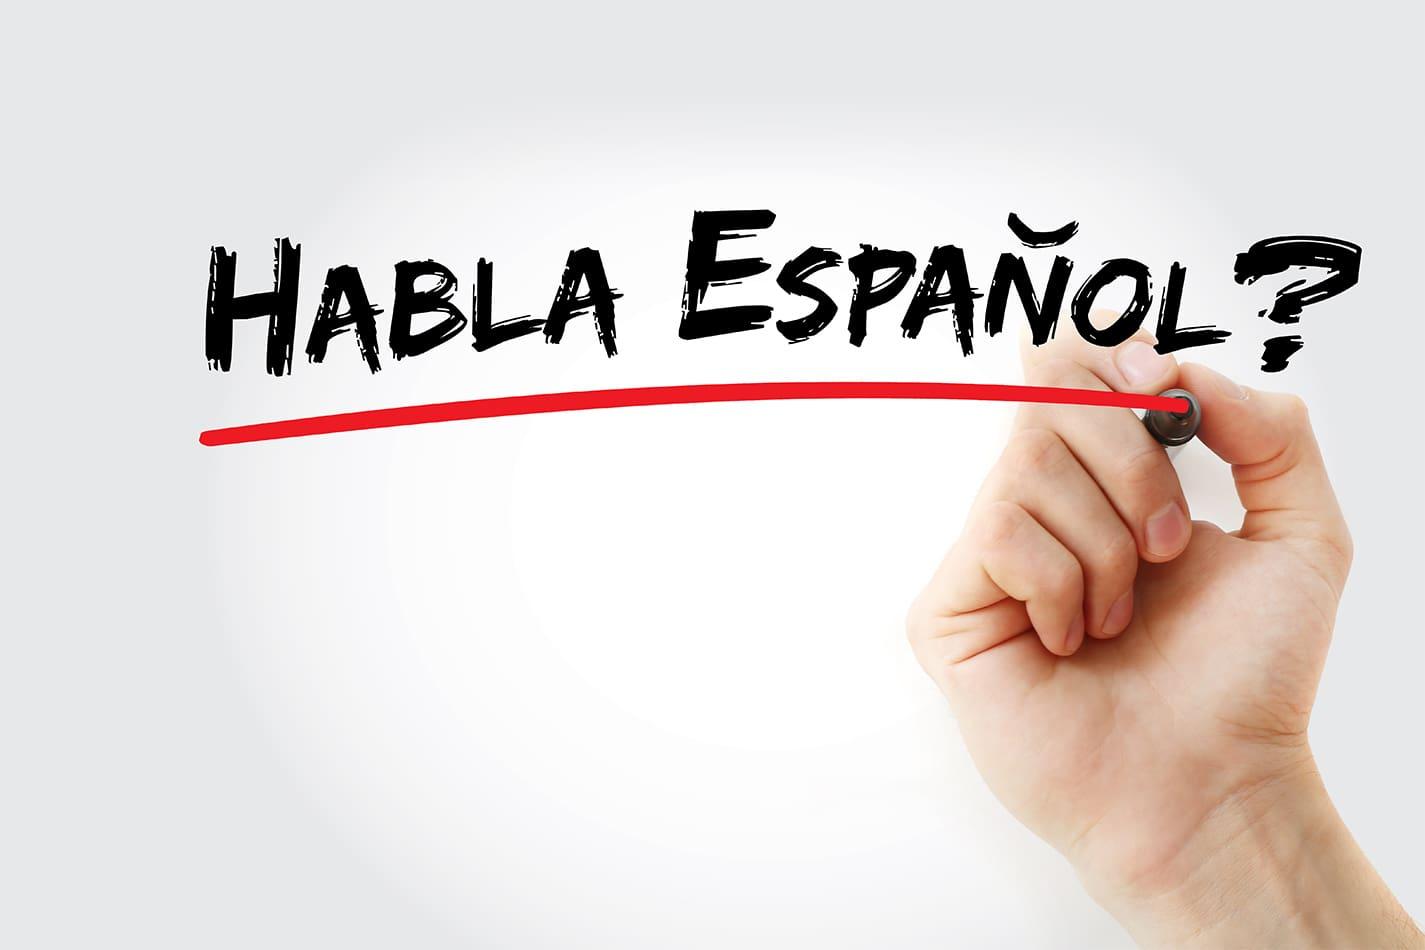 Se Habla Espanol - Spanish Speaking Plumbing Service in Richmond, VA